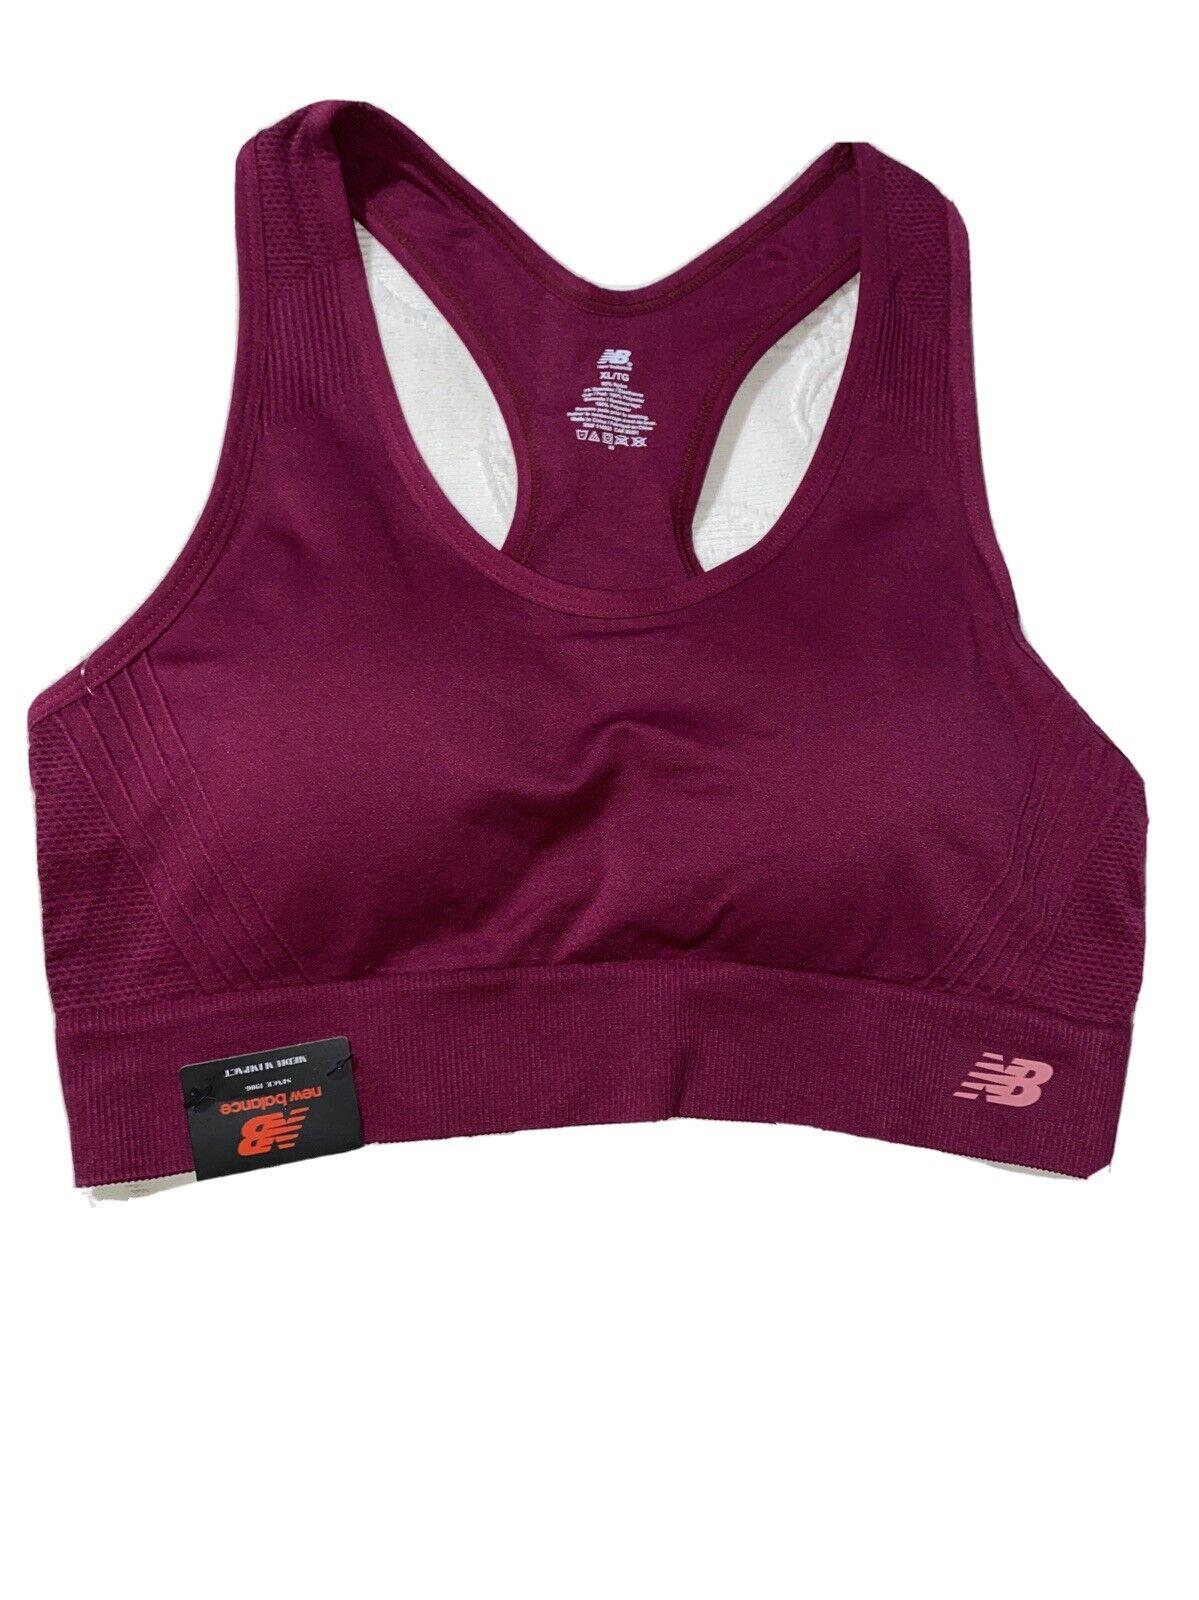 New Balance Medium Impact Sports Bra Style # 112011 Deep Jewel- Red Size XL